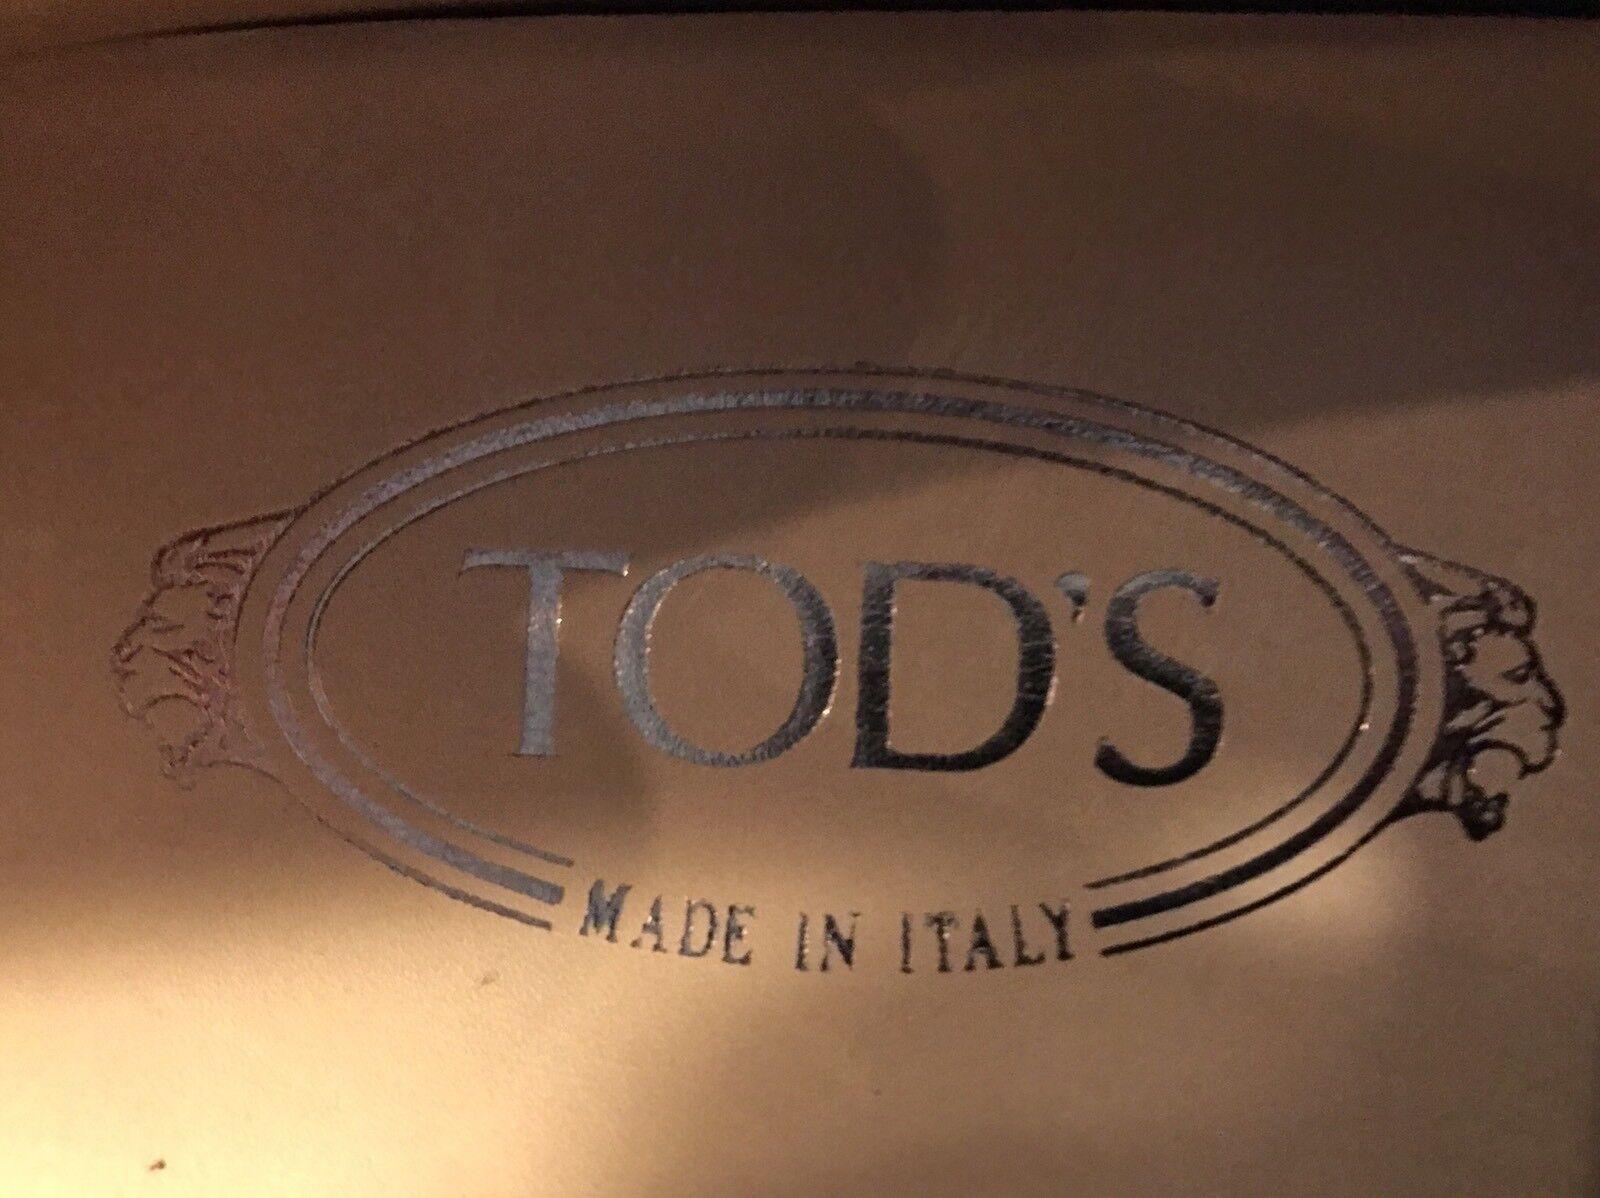 2018  Tod'S Rojo Gamuza Laccetto City Gommini controladores UU. de EE. UU. controladores hecho en Italia b33a53